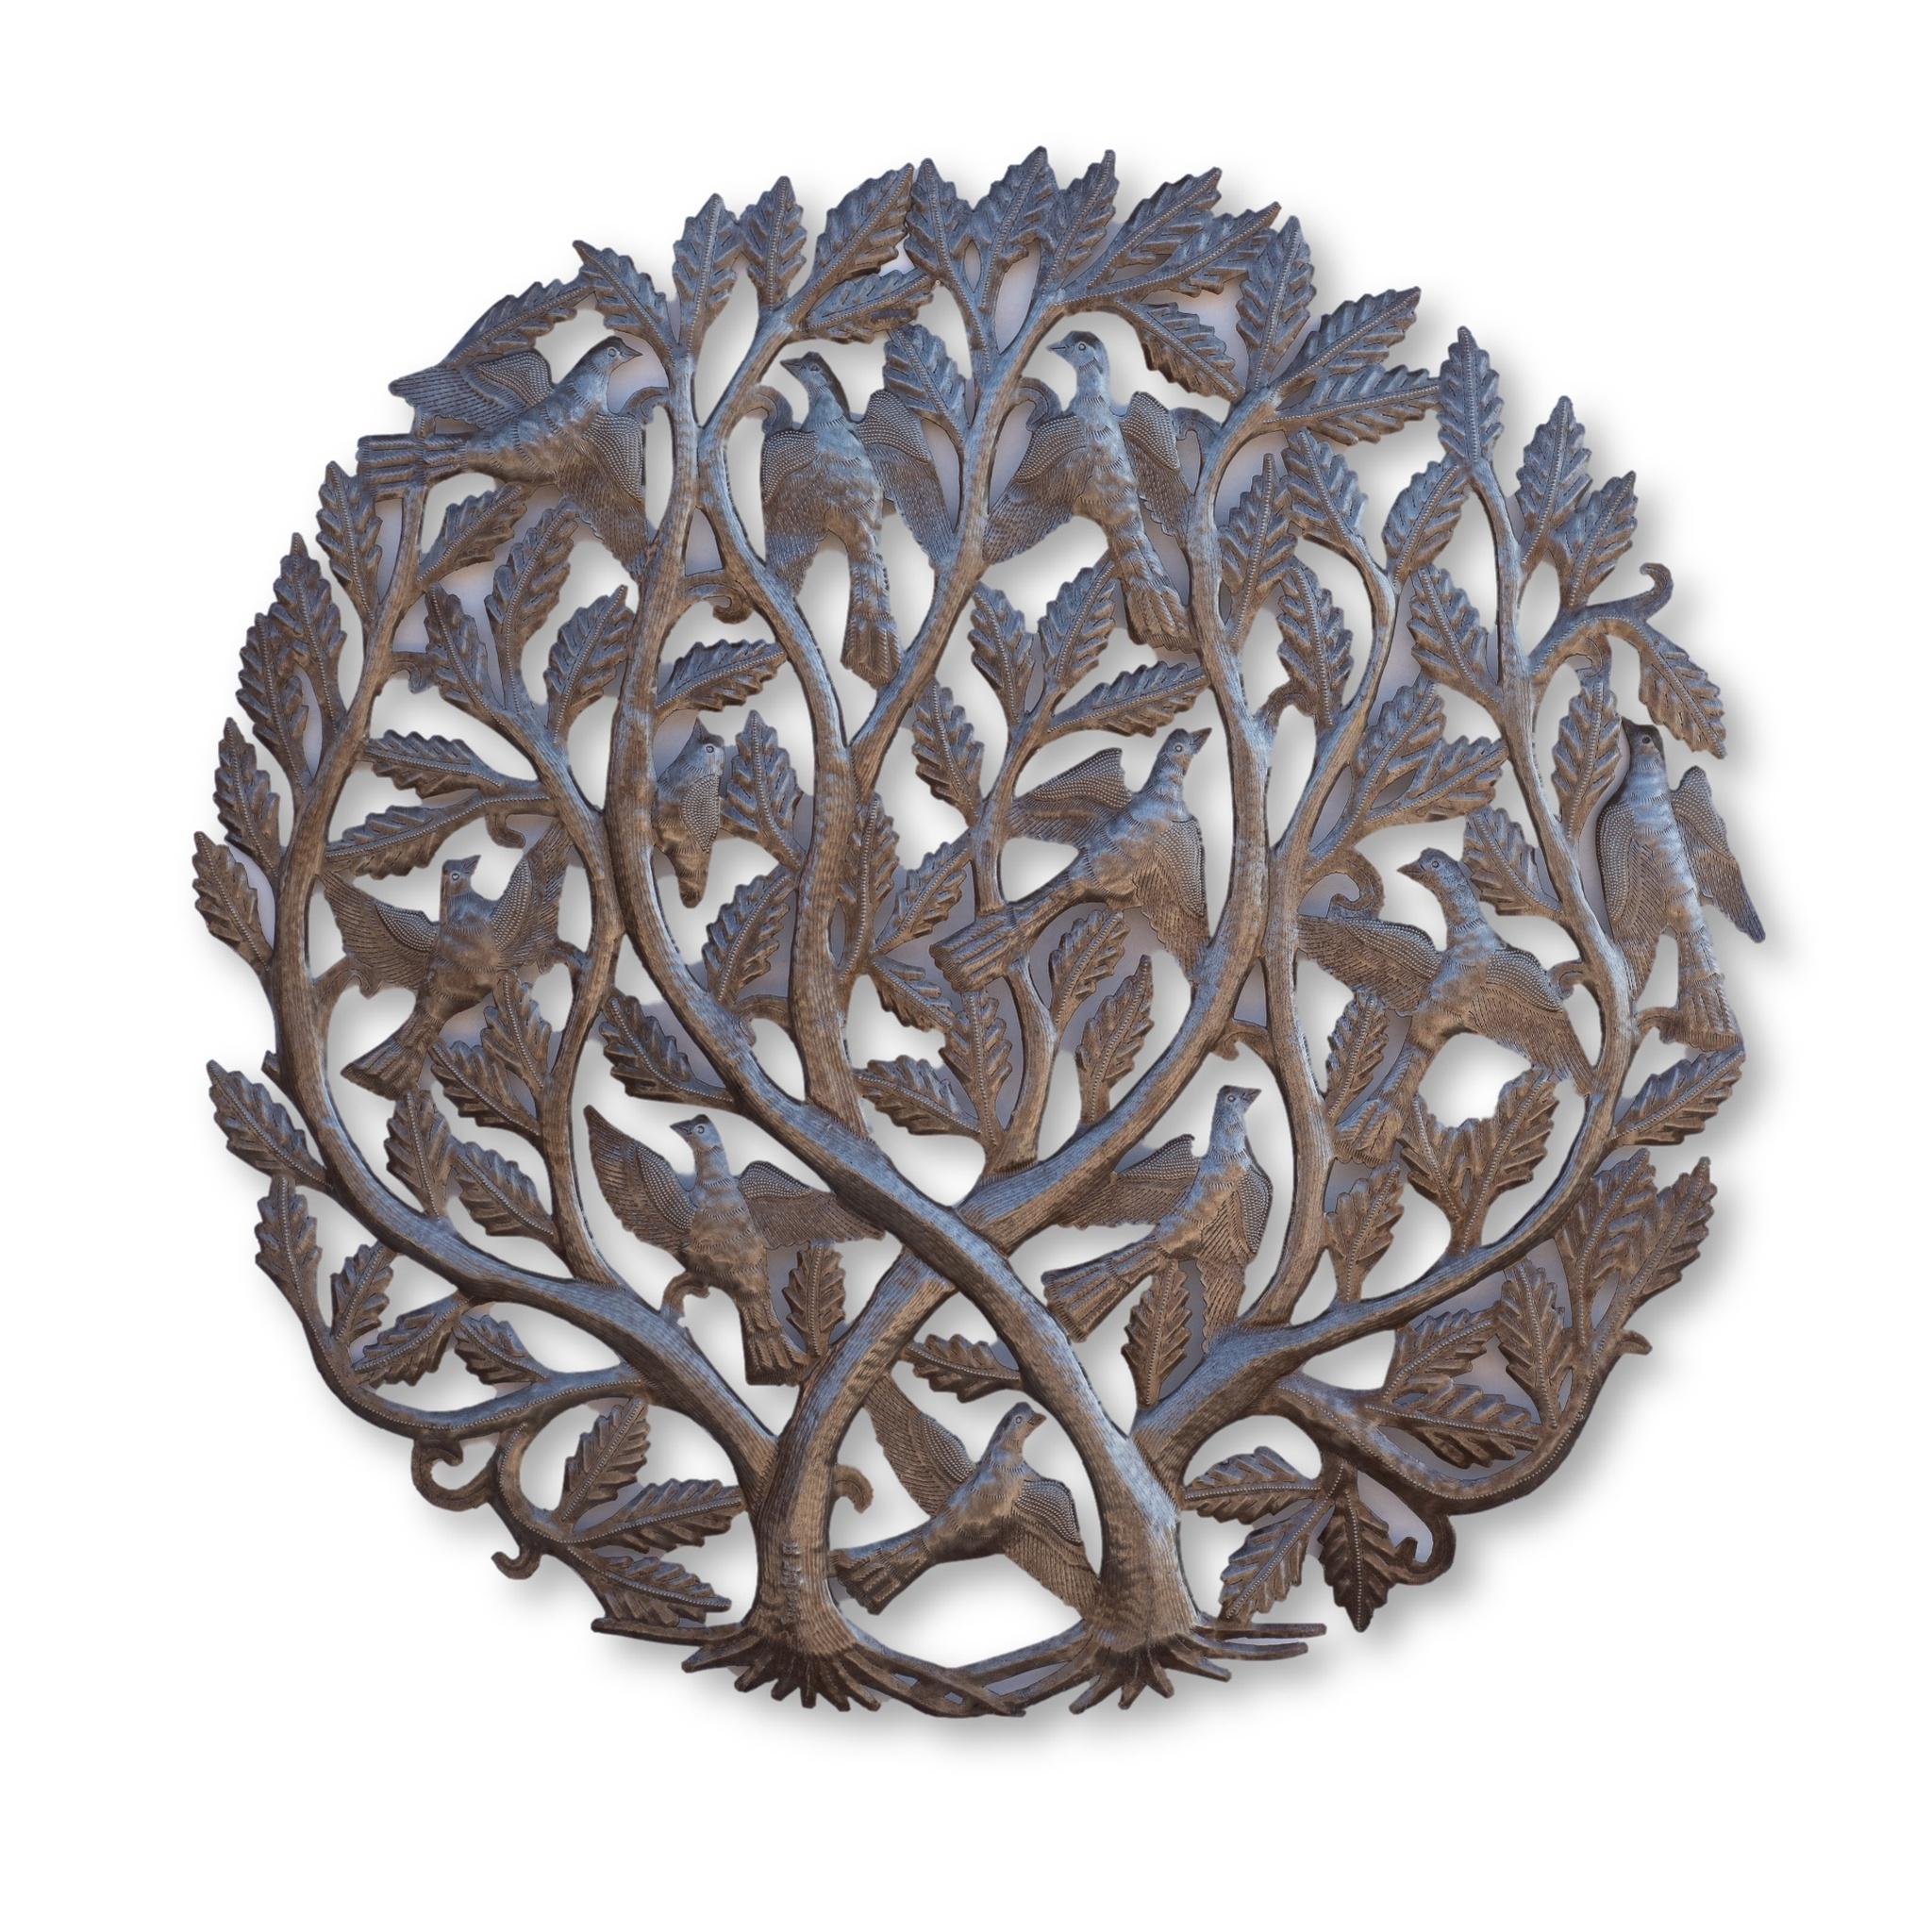 Intertwined Tree of Life